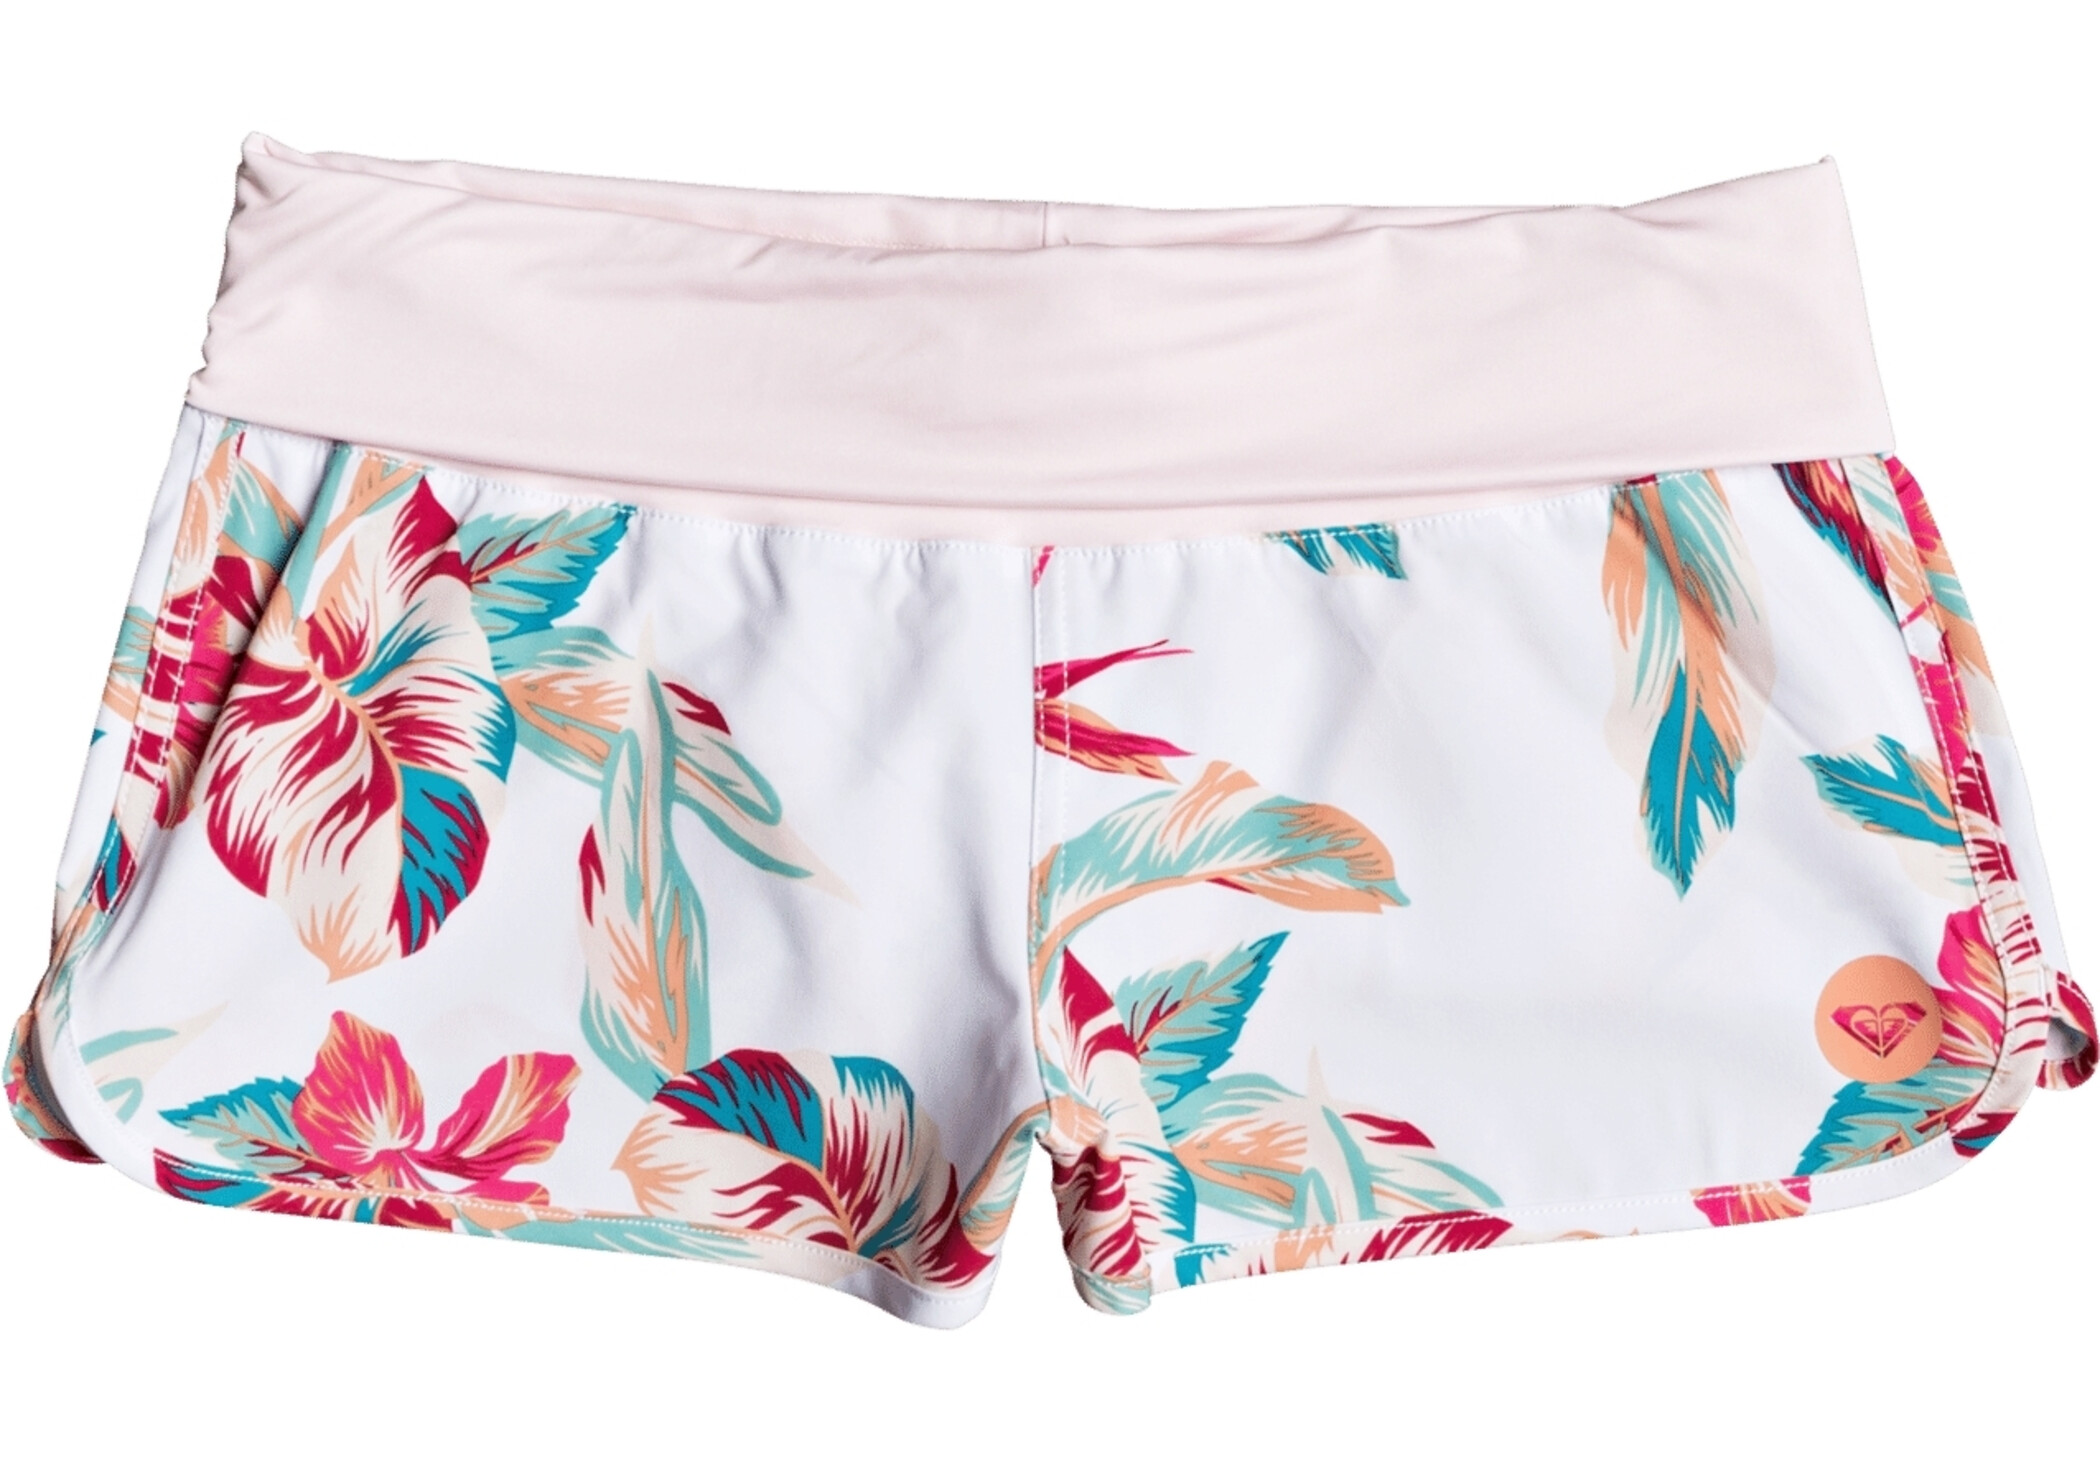 Roxy Endless Summer Printed Pantalones Cortos Mujer Bright White Tropic Call S Campz Es